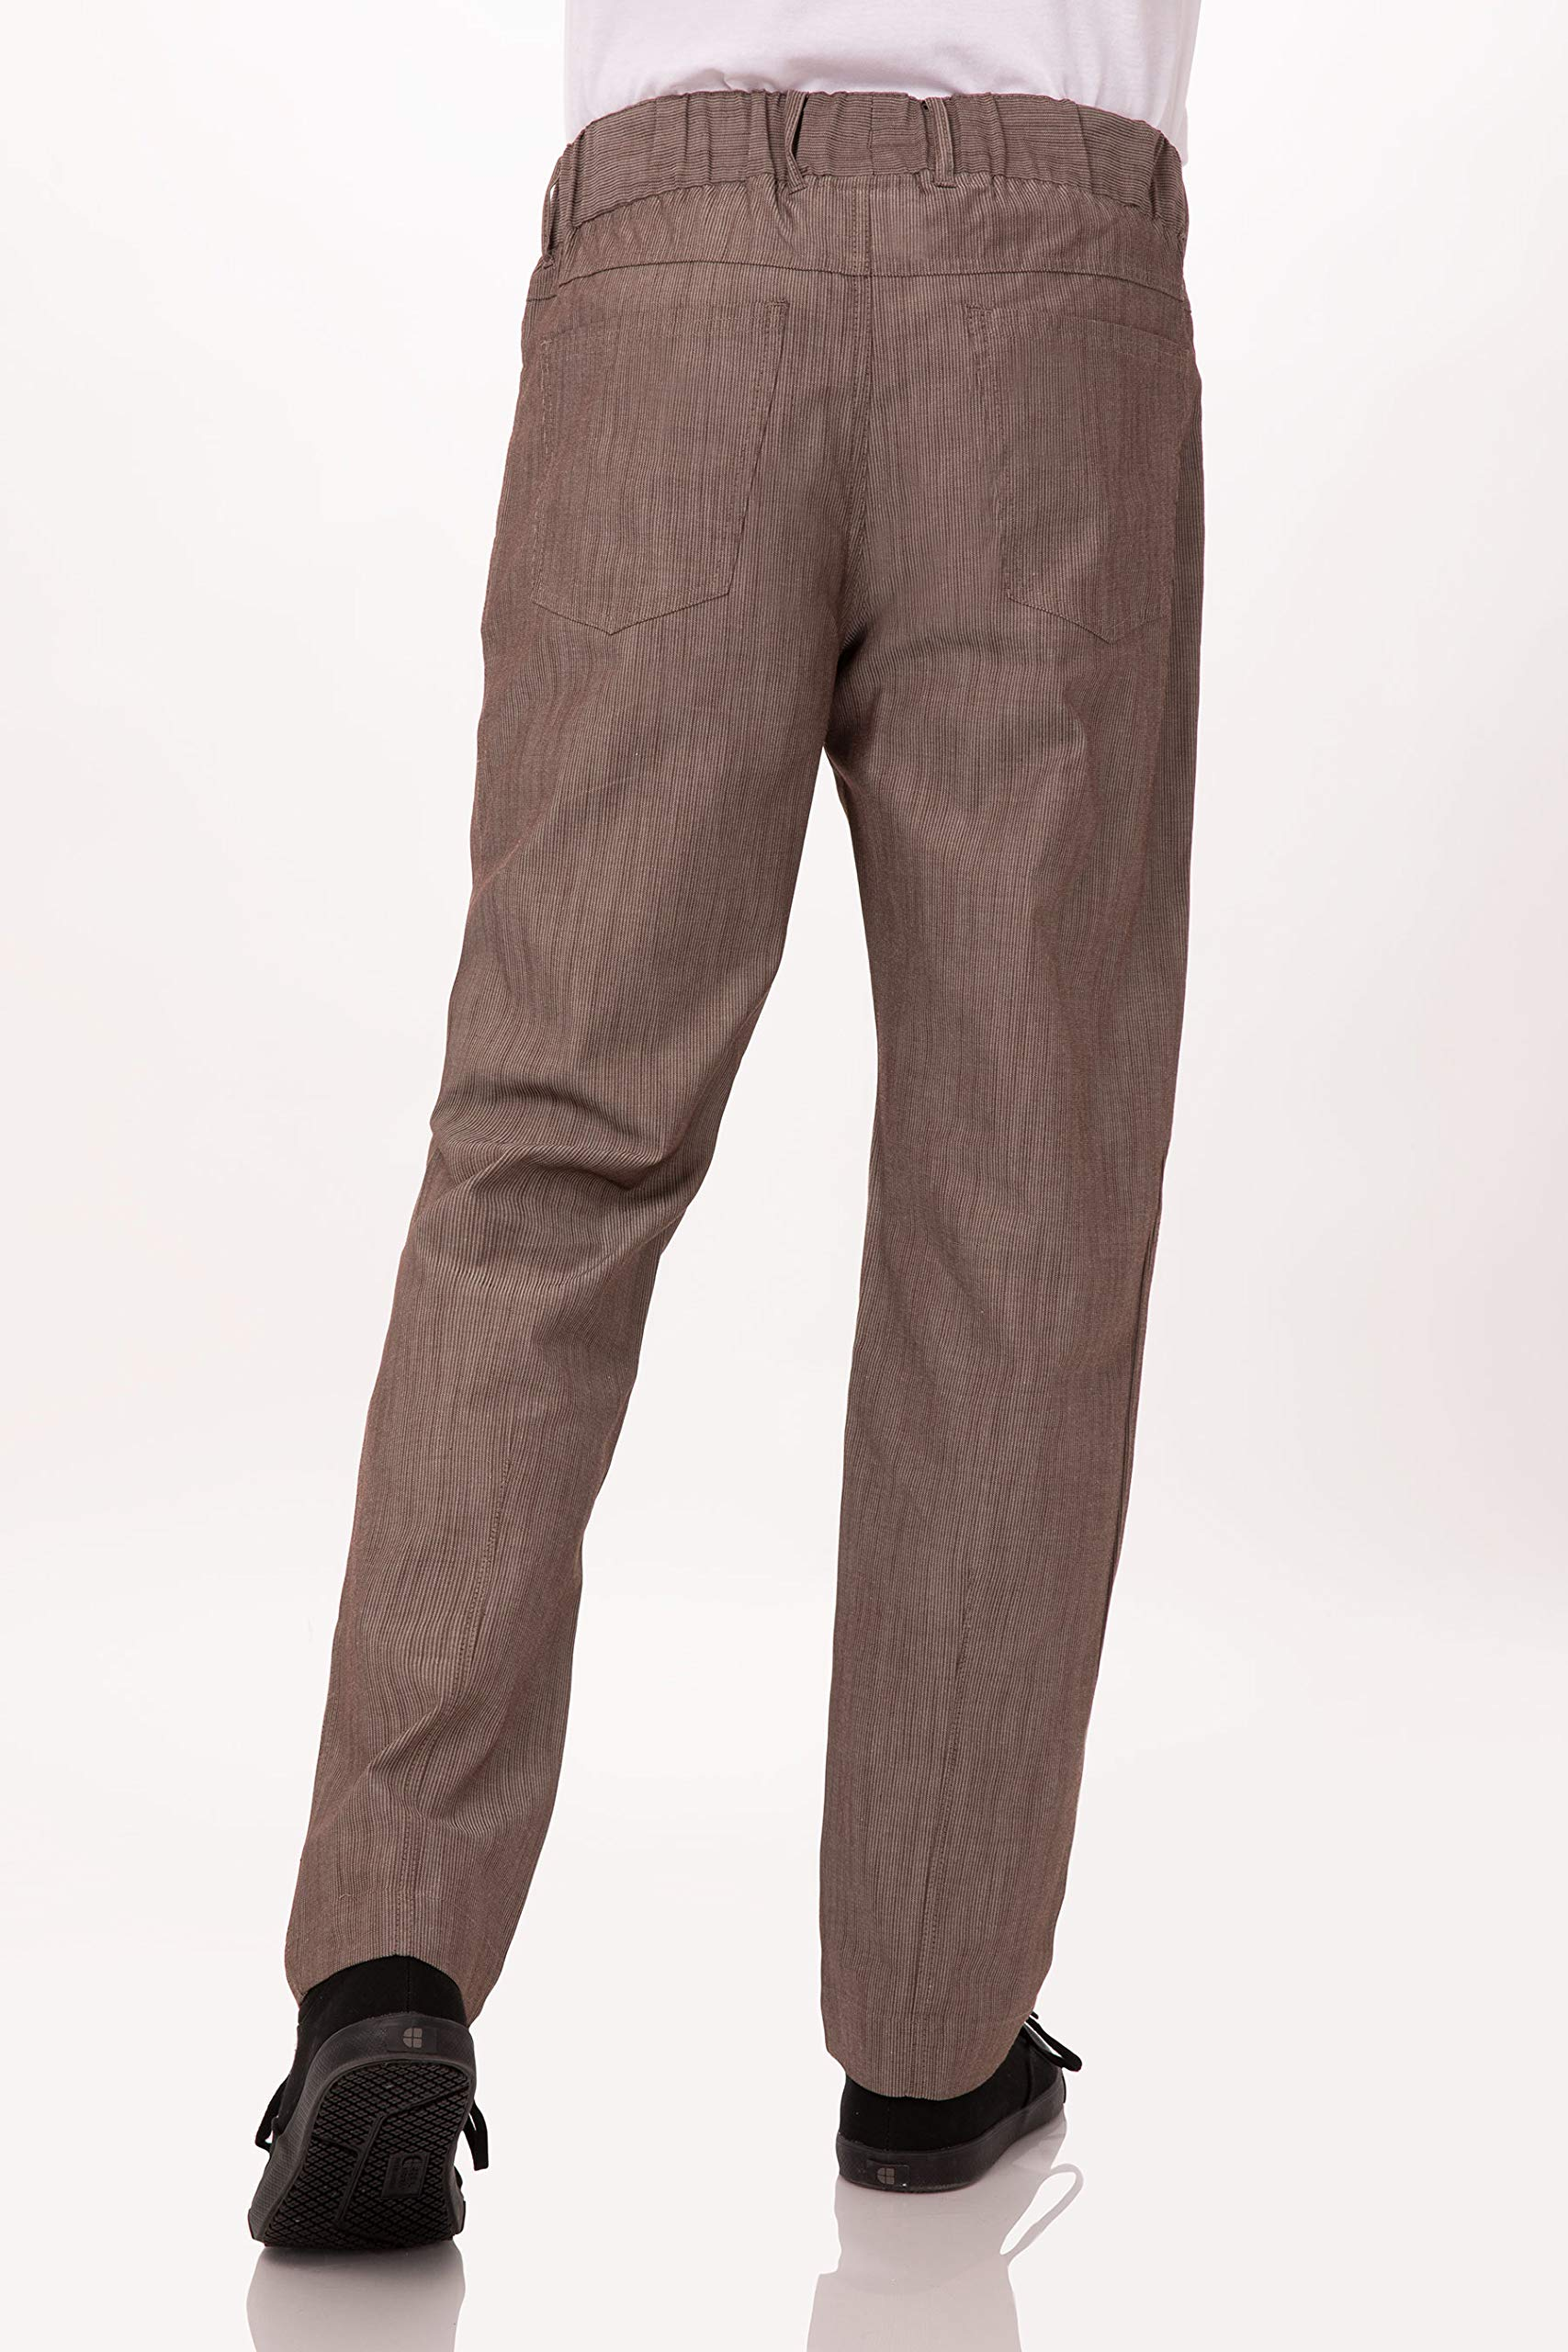 Black /& White Stripe Medium TAXFREE Chef Works Men/'s Jogger 257 Chef Pants